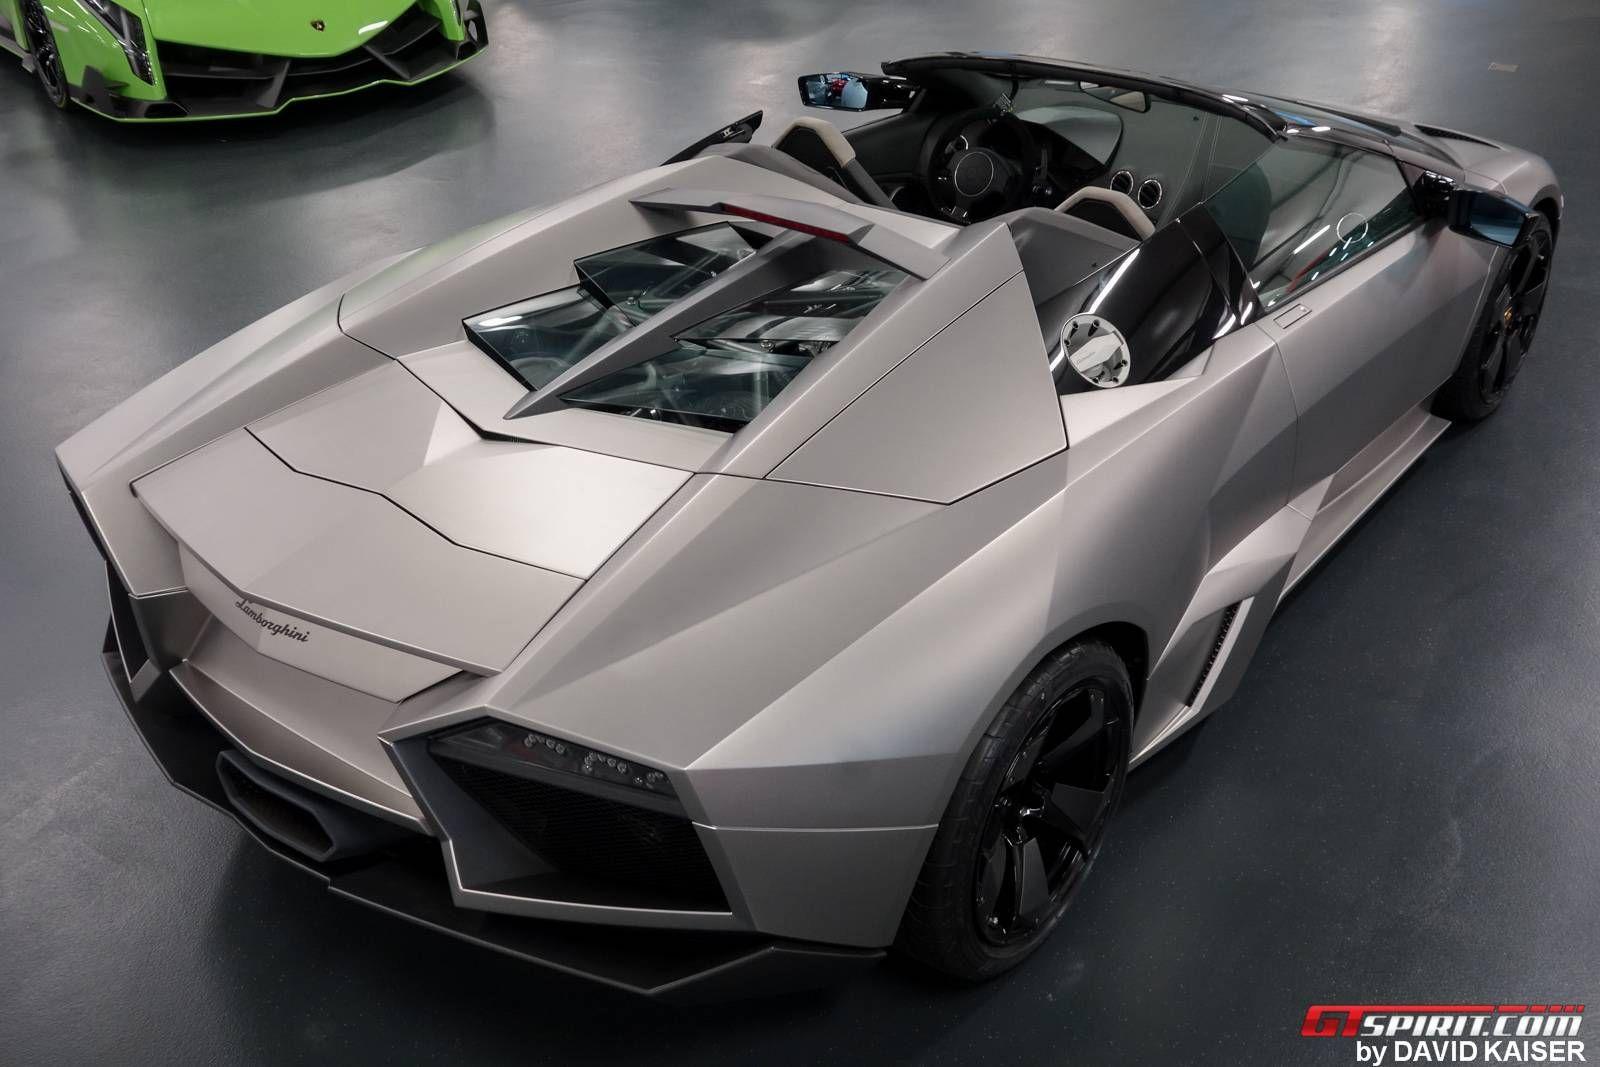 Photo Of The Day Lamborghini Reventon Roadster Gtspirit Cars